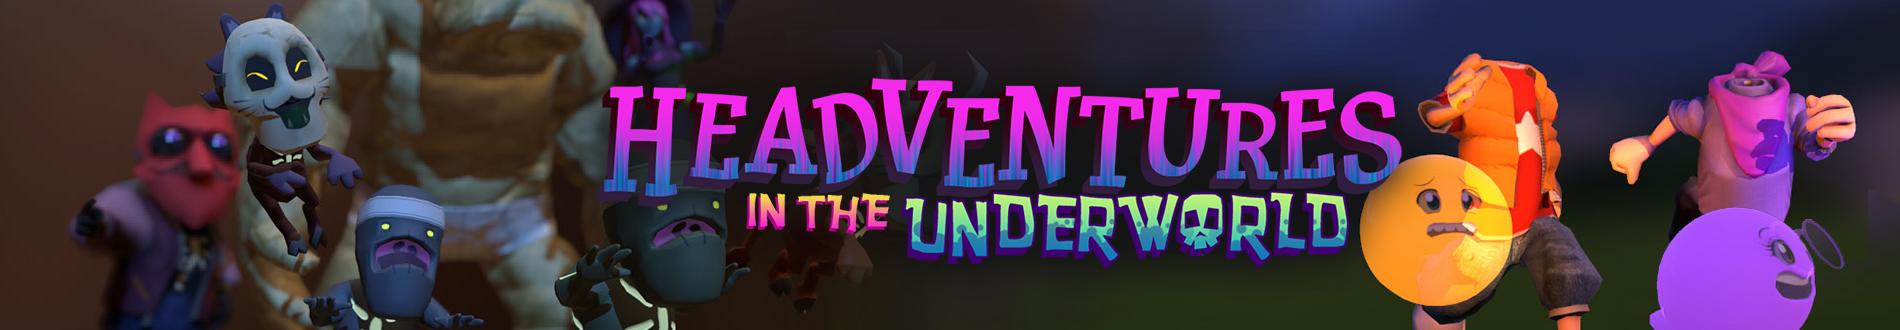 Headventures in the Underworld